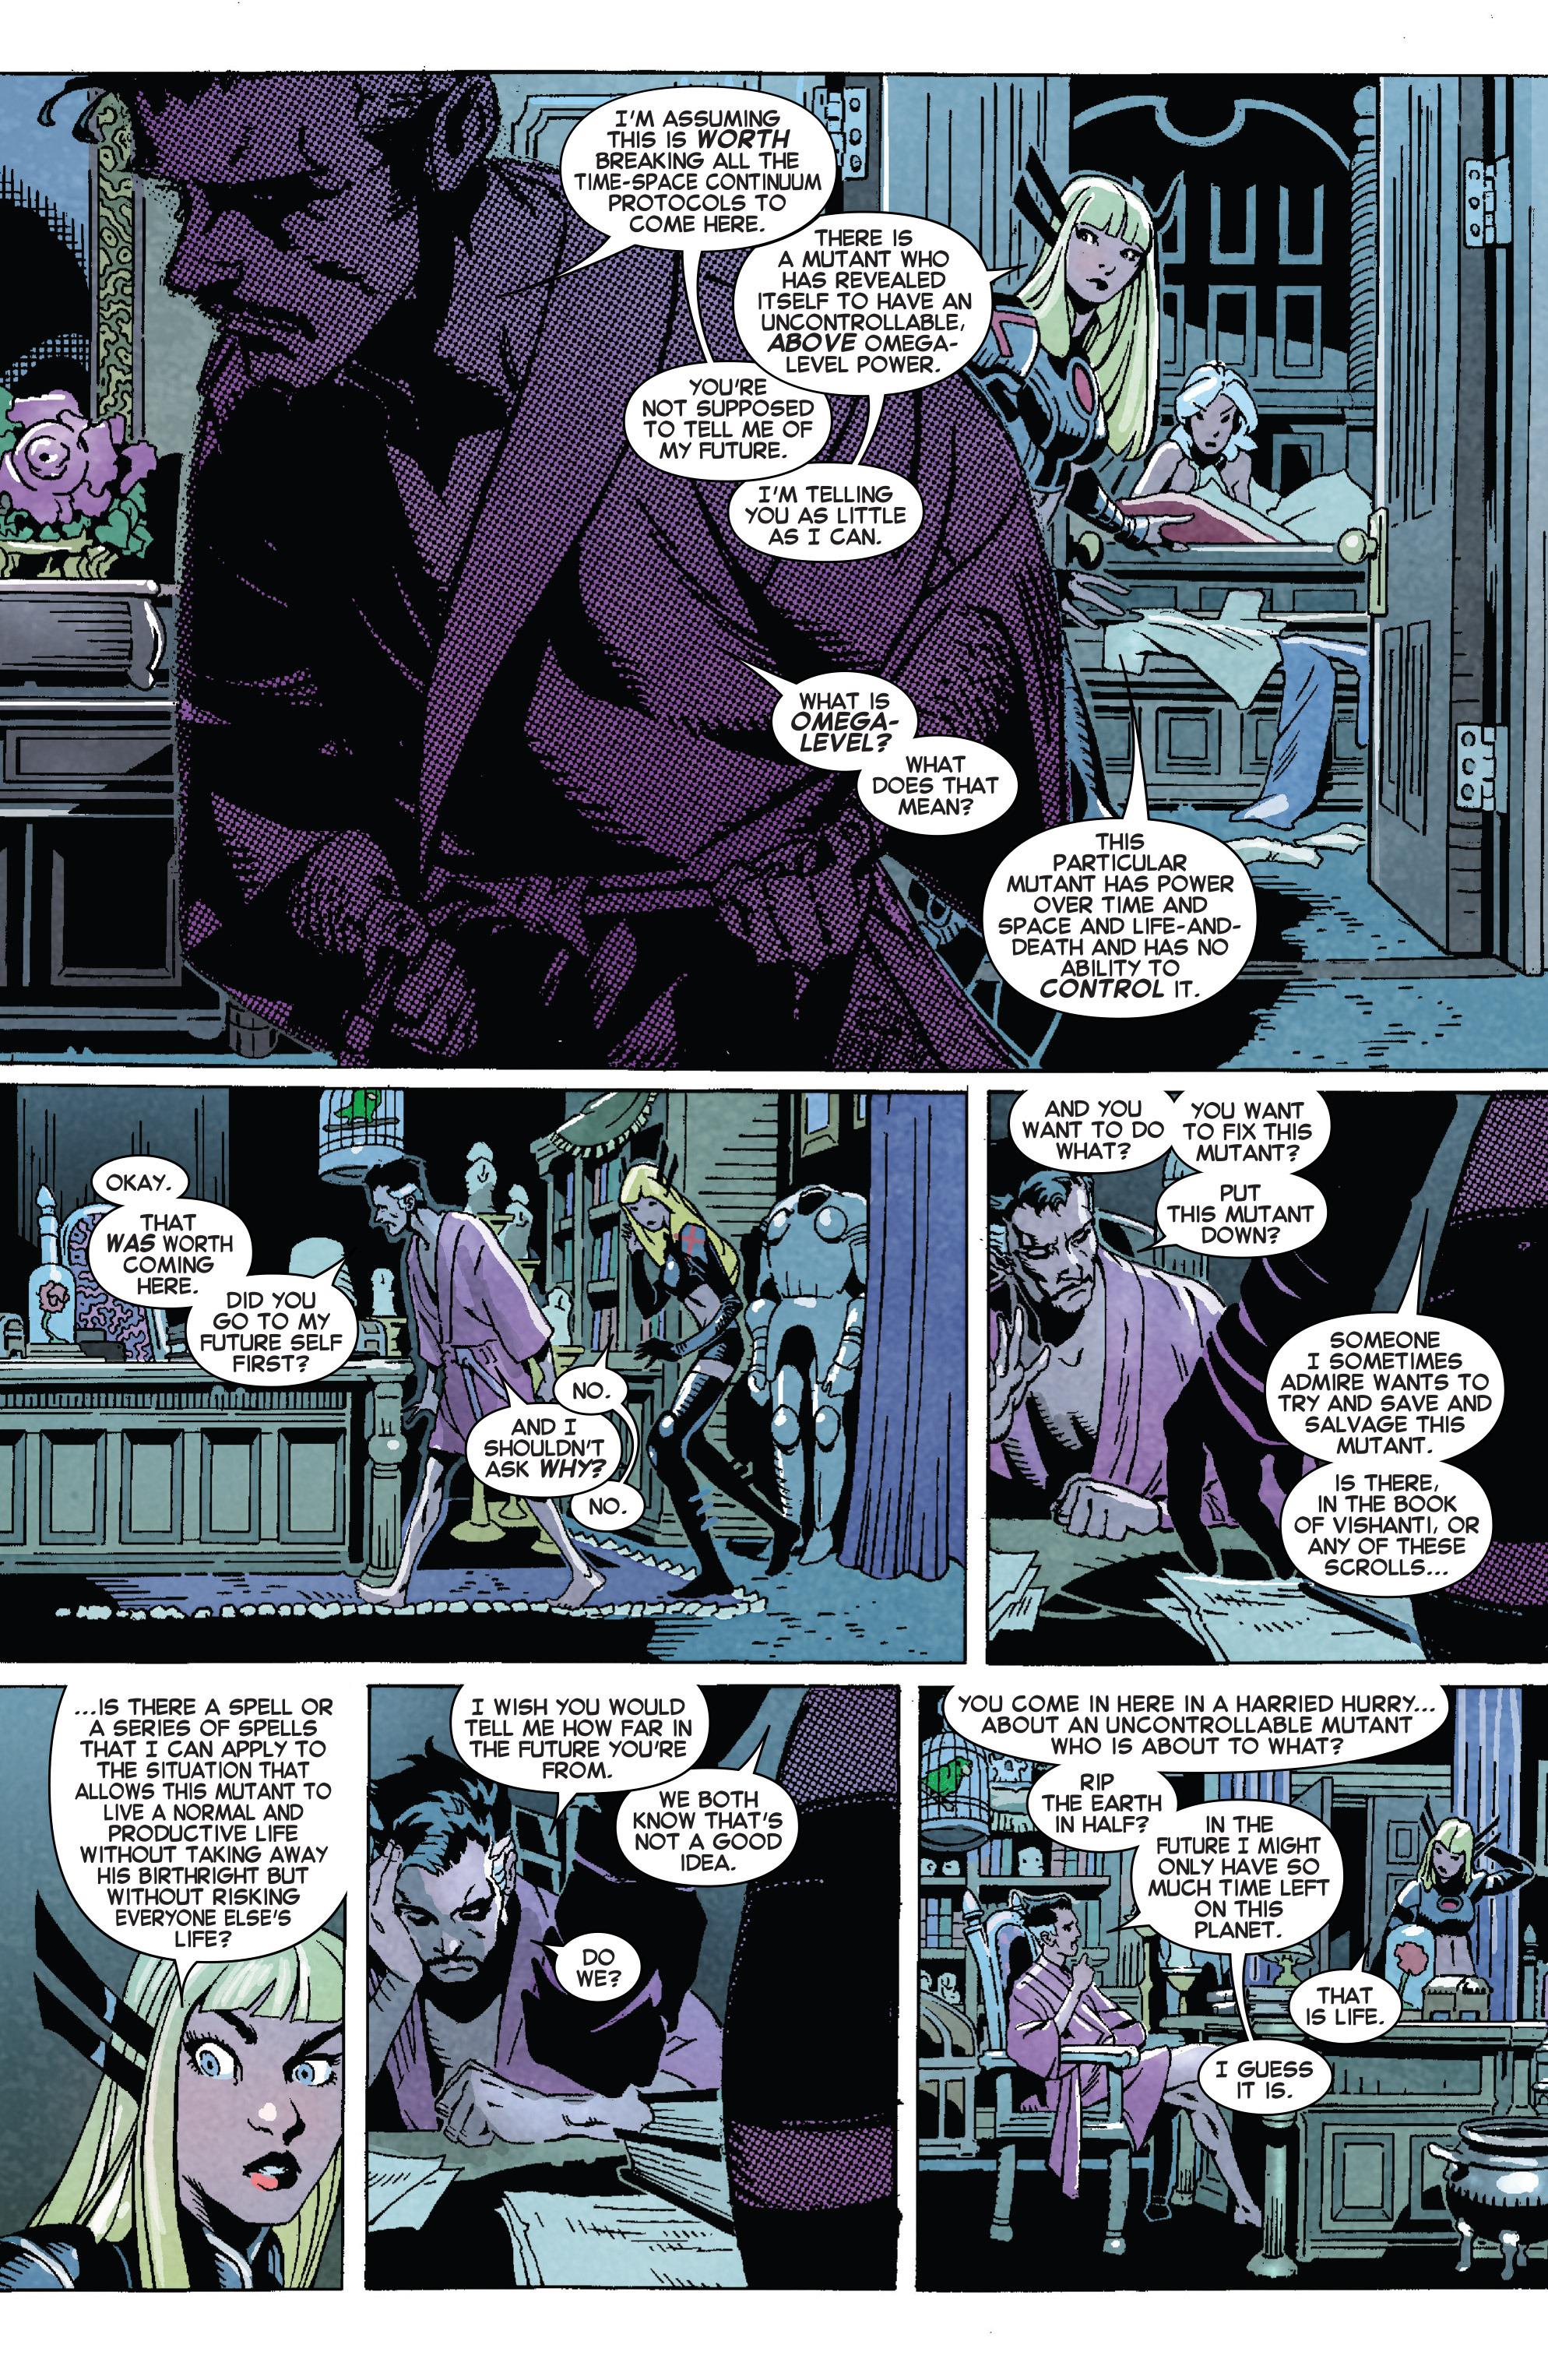 Read online Uncanny X-Men (2013) comic -  Issue # _TPB 5 - The Omega Mutant - 60